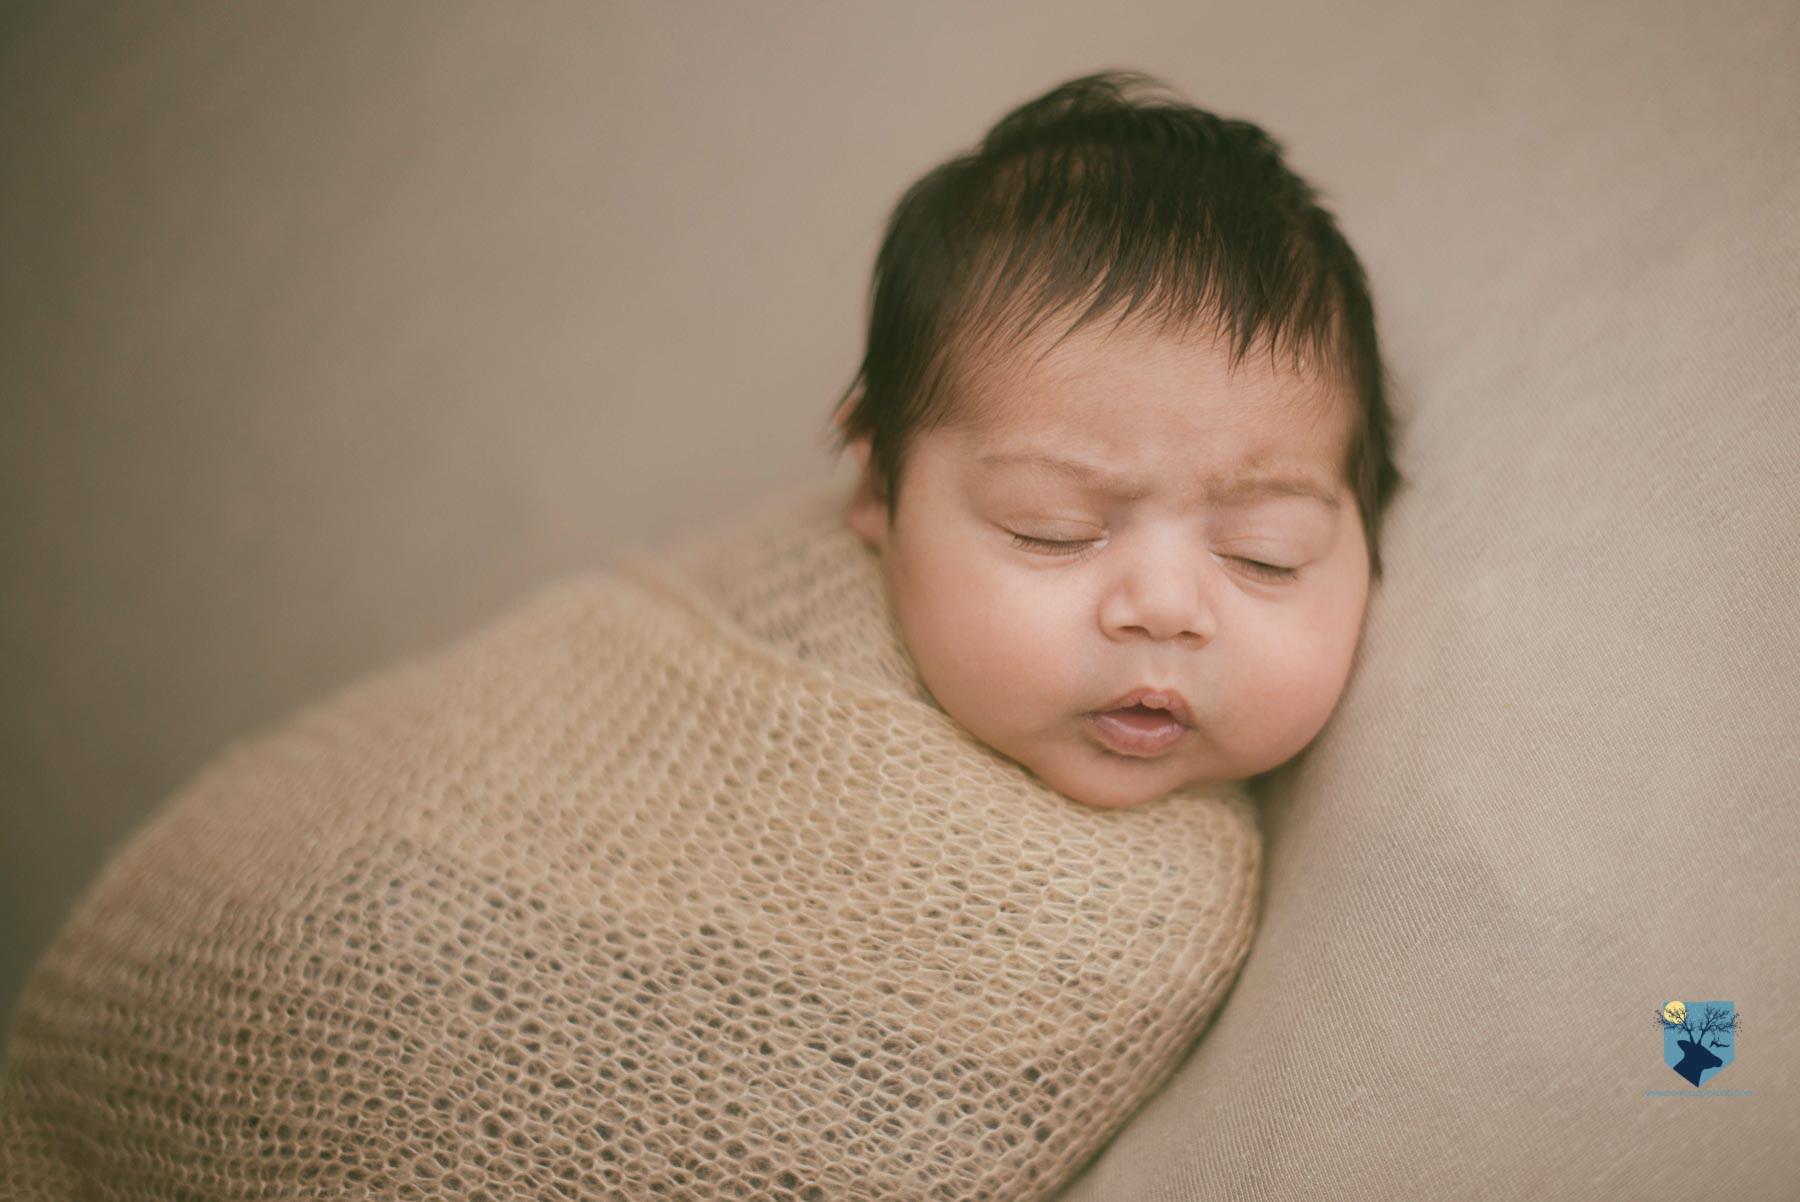 fotografia,girona,figueres,emporda,monica quintana,bebes,niños,familia,retrato,recien,nacido,nado,newborn,sarria de ter